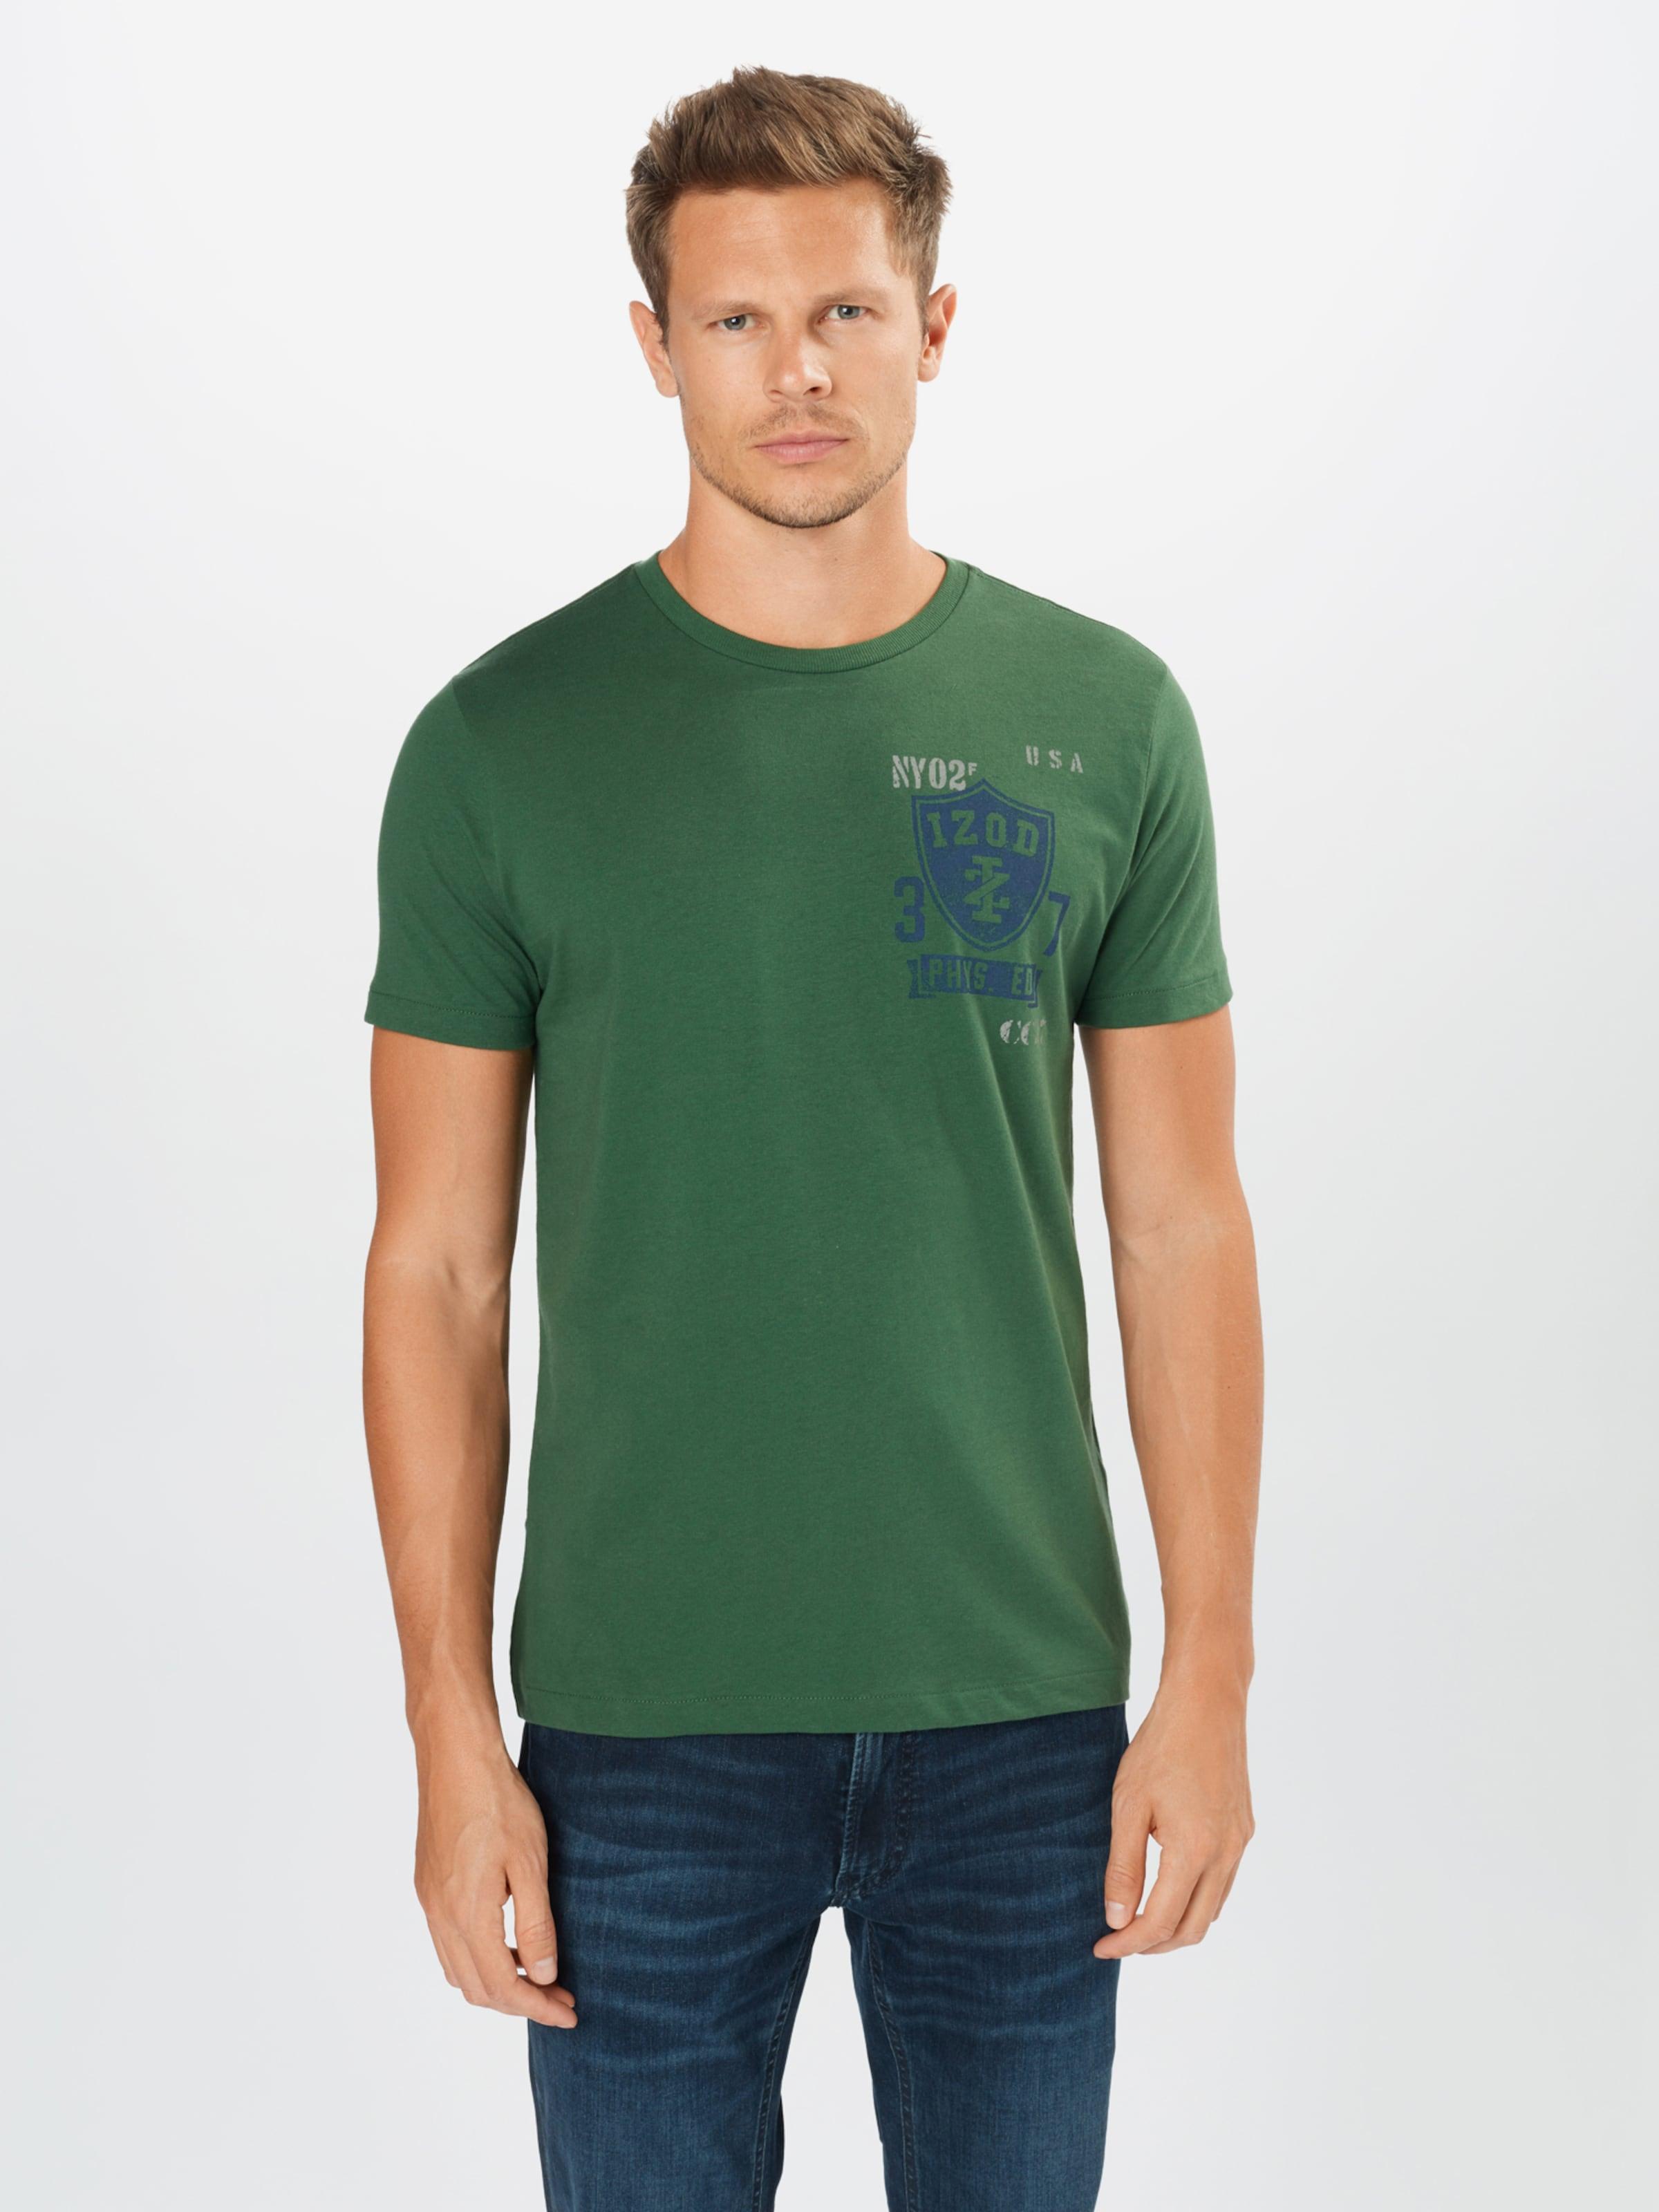 IZOD Shirt in blau / grün / weiß Logoprint IZO0191002000001